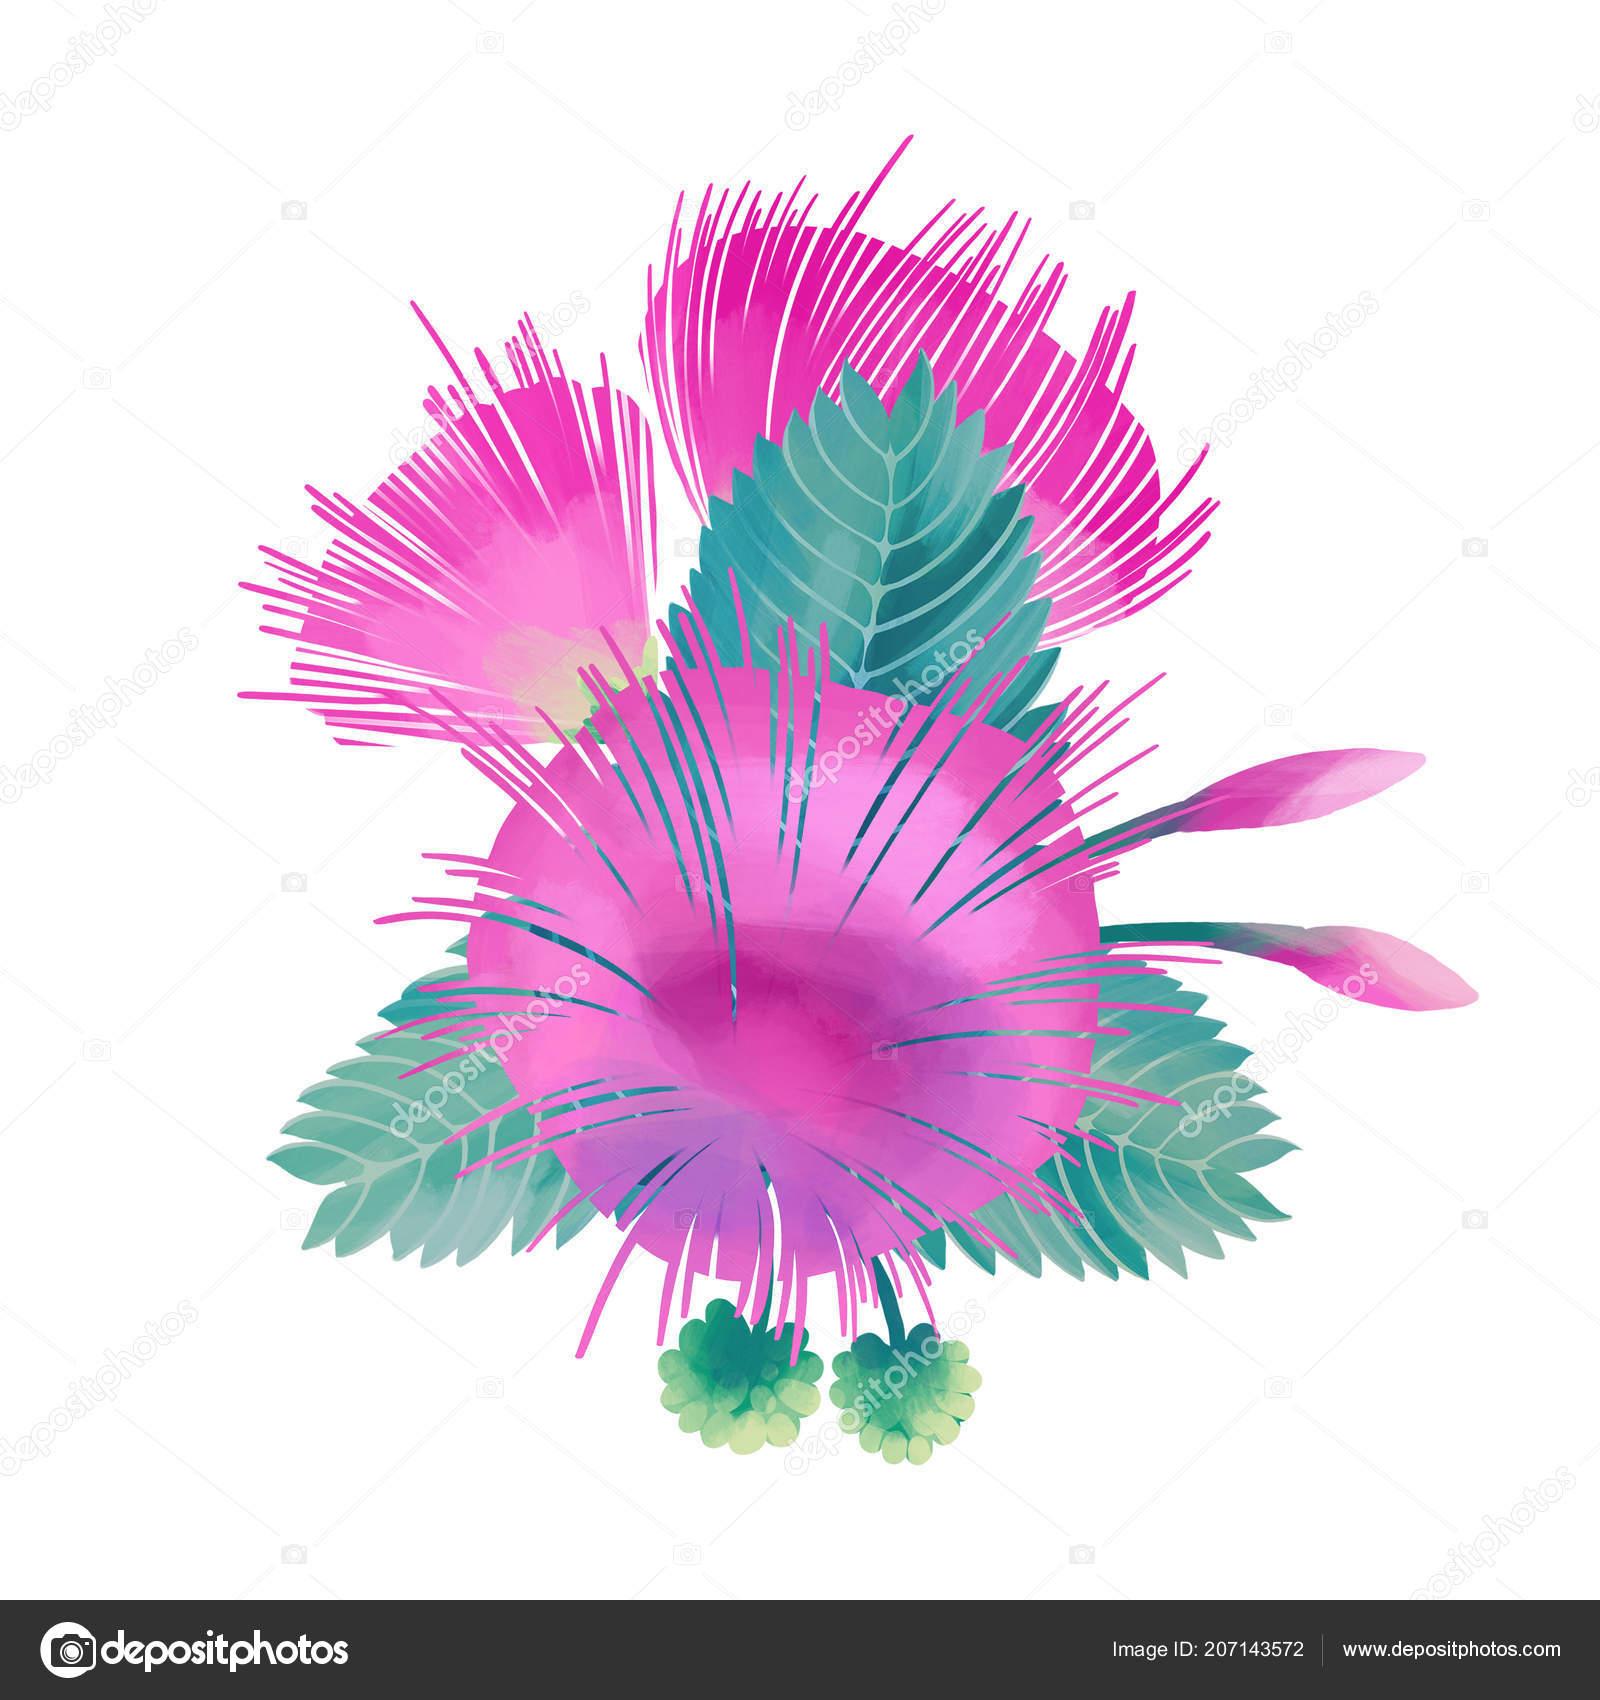 Pastel Colored Design With Albizia Flowers Stock Photo